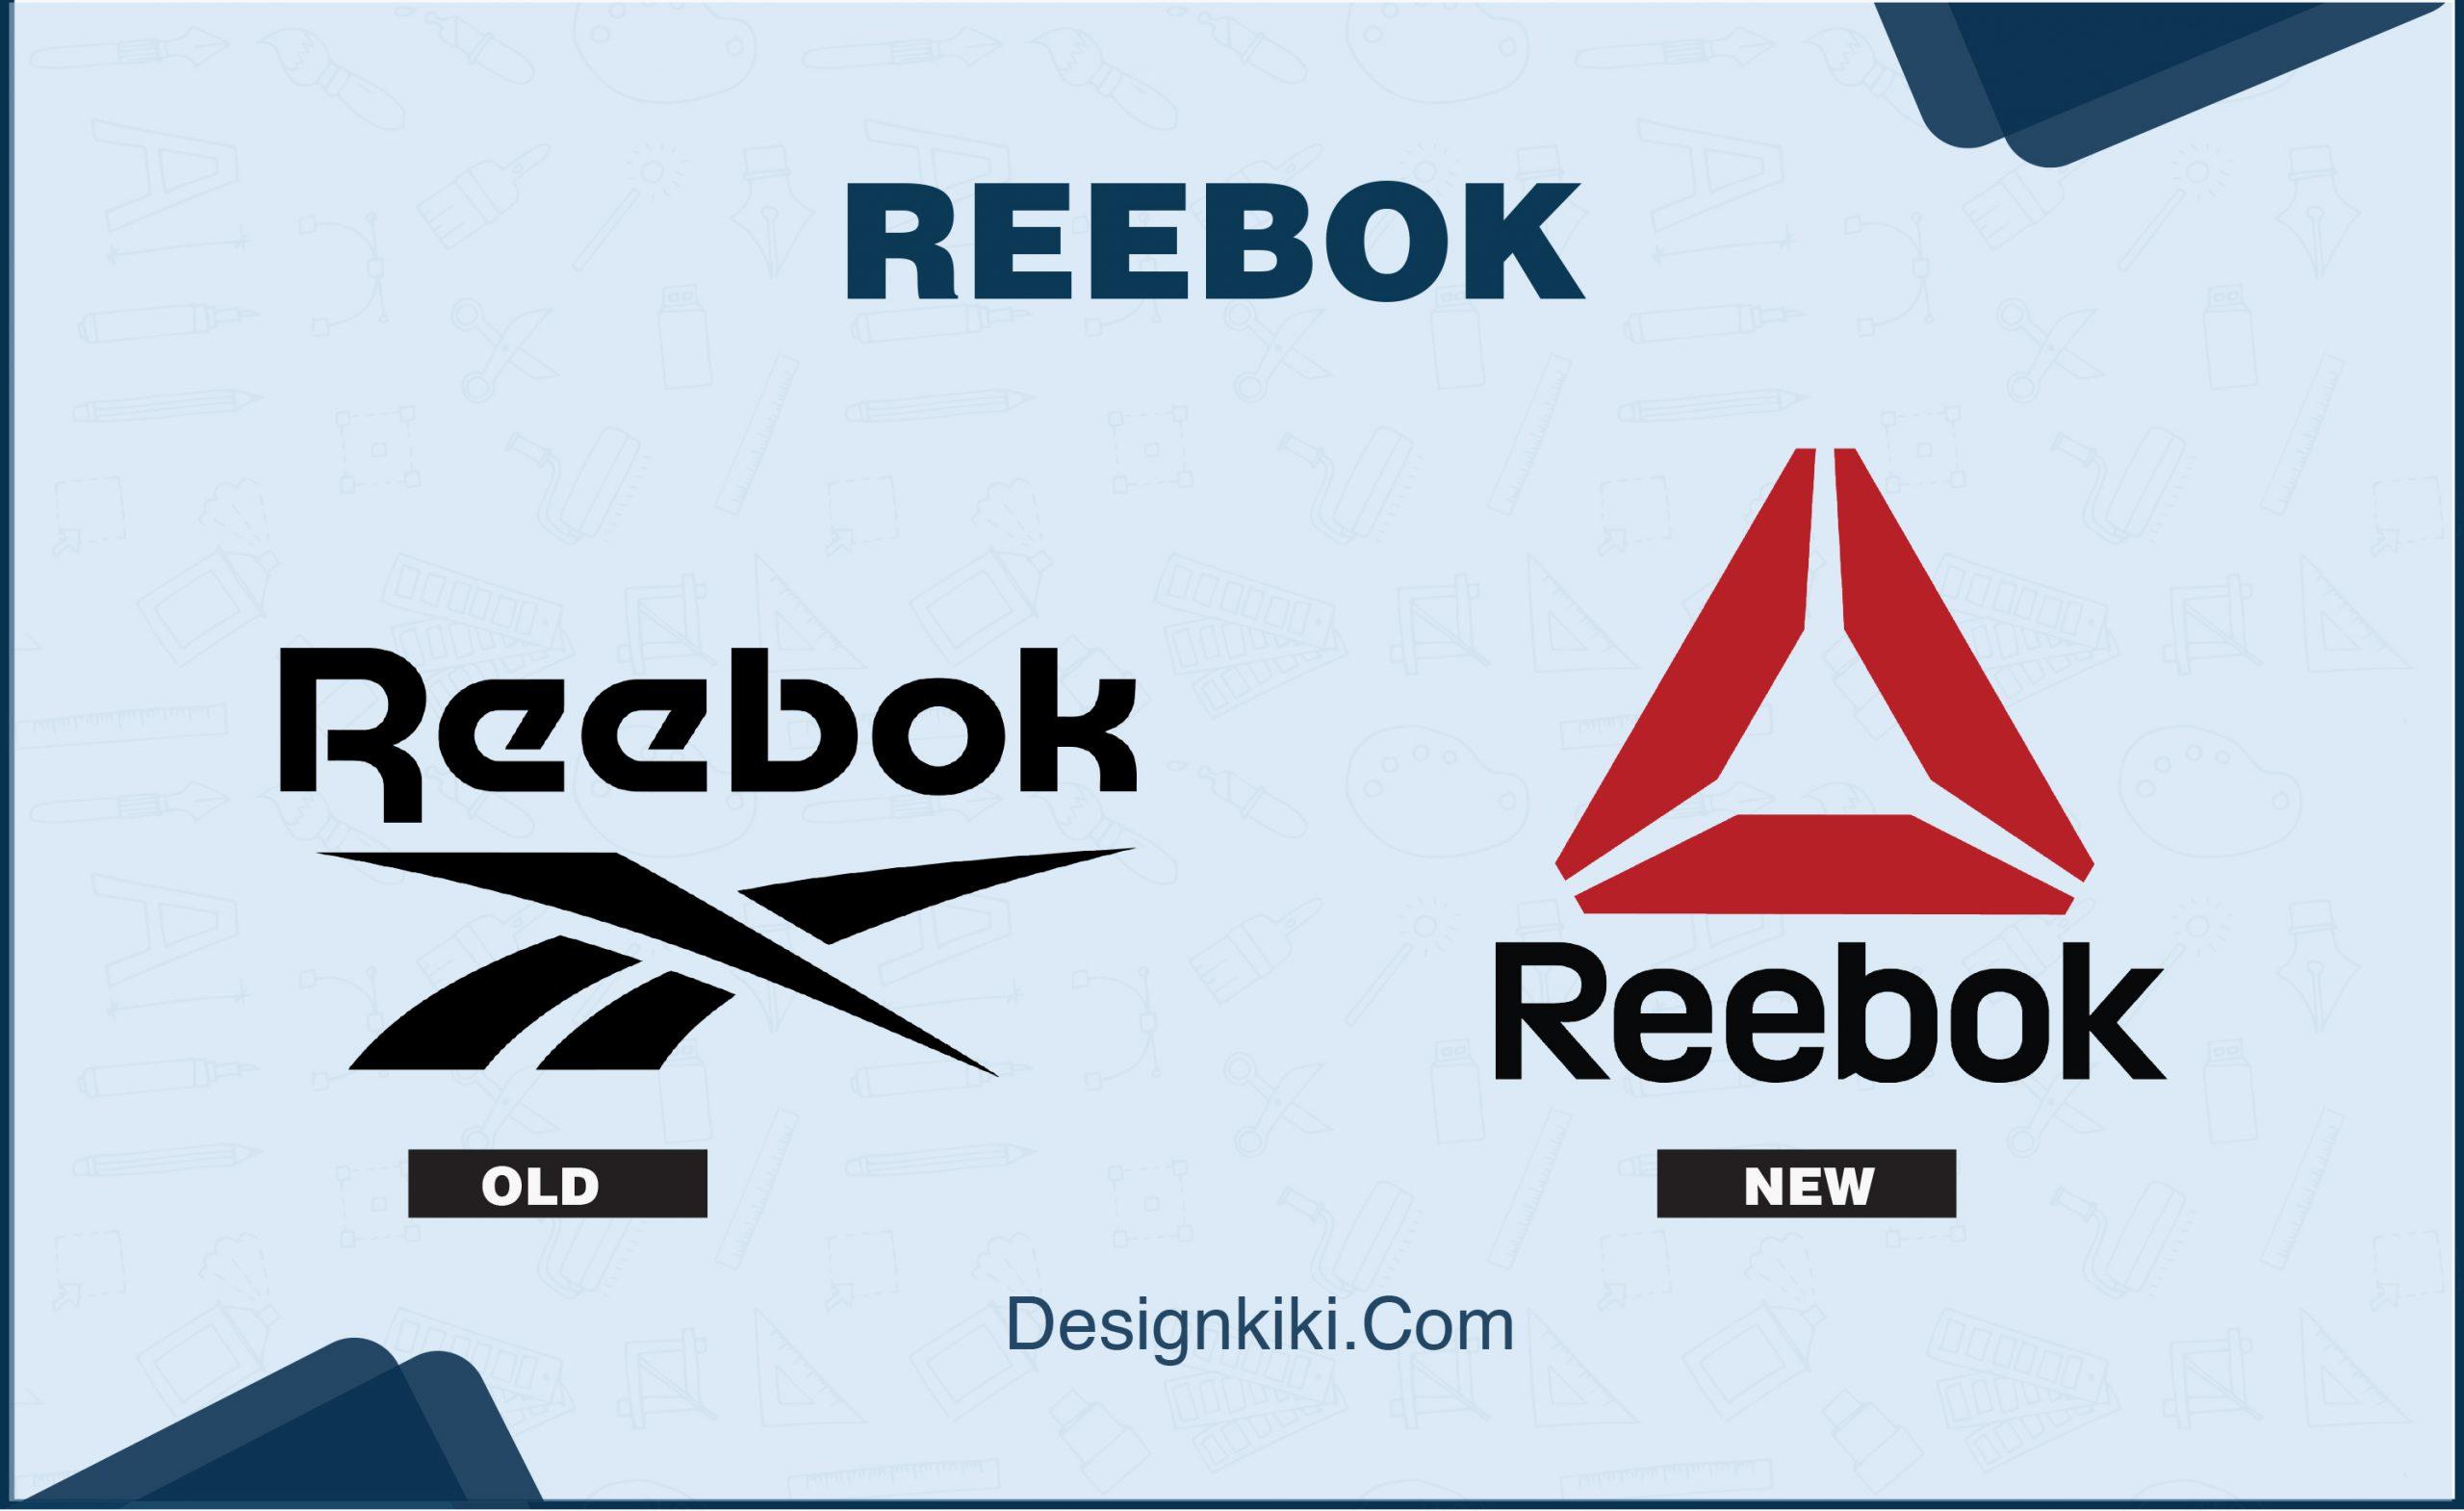 worst logo redesigns- Reebok